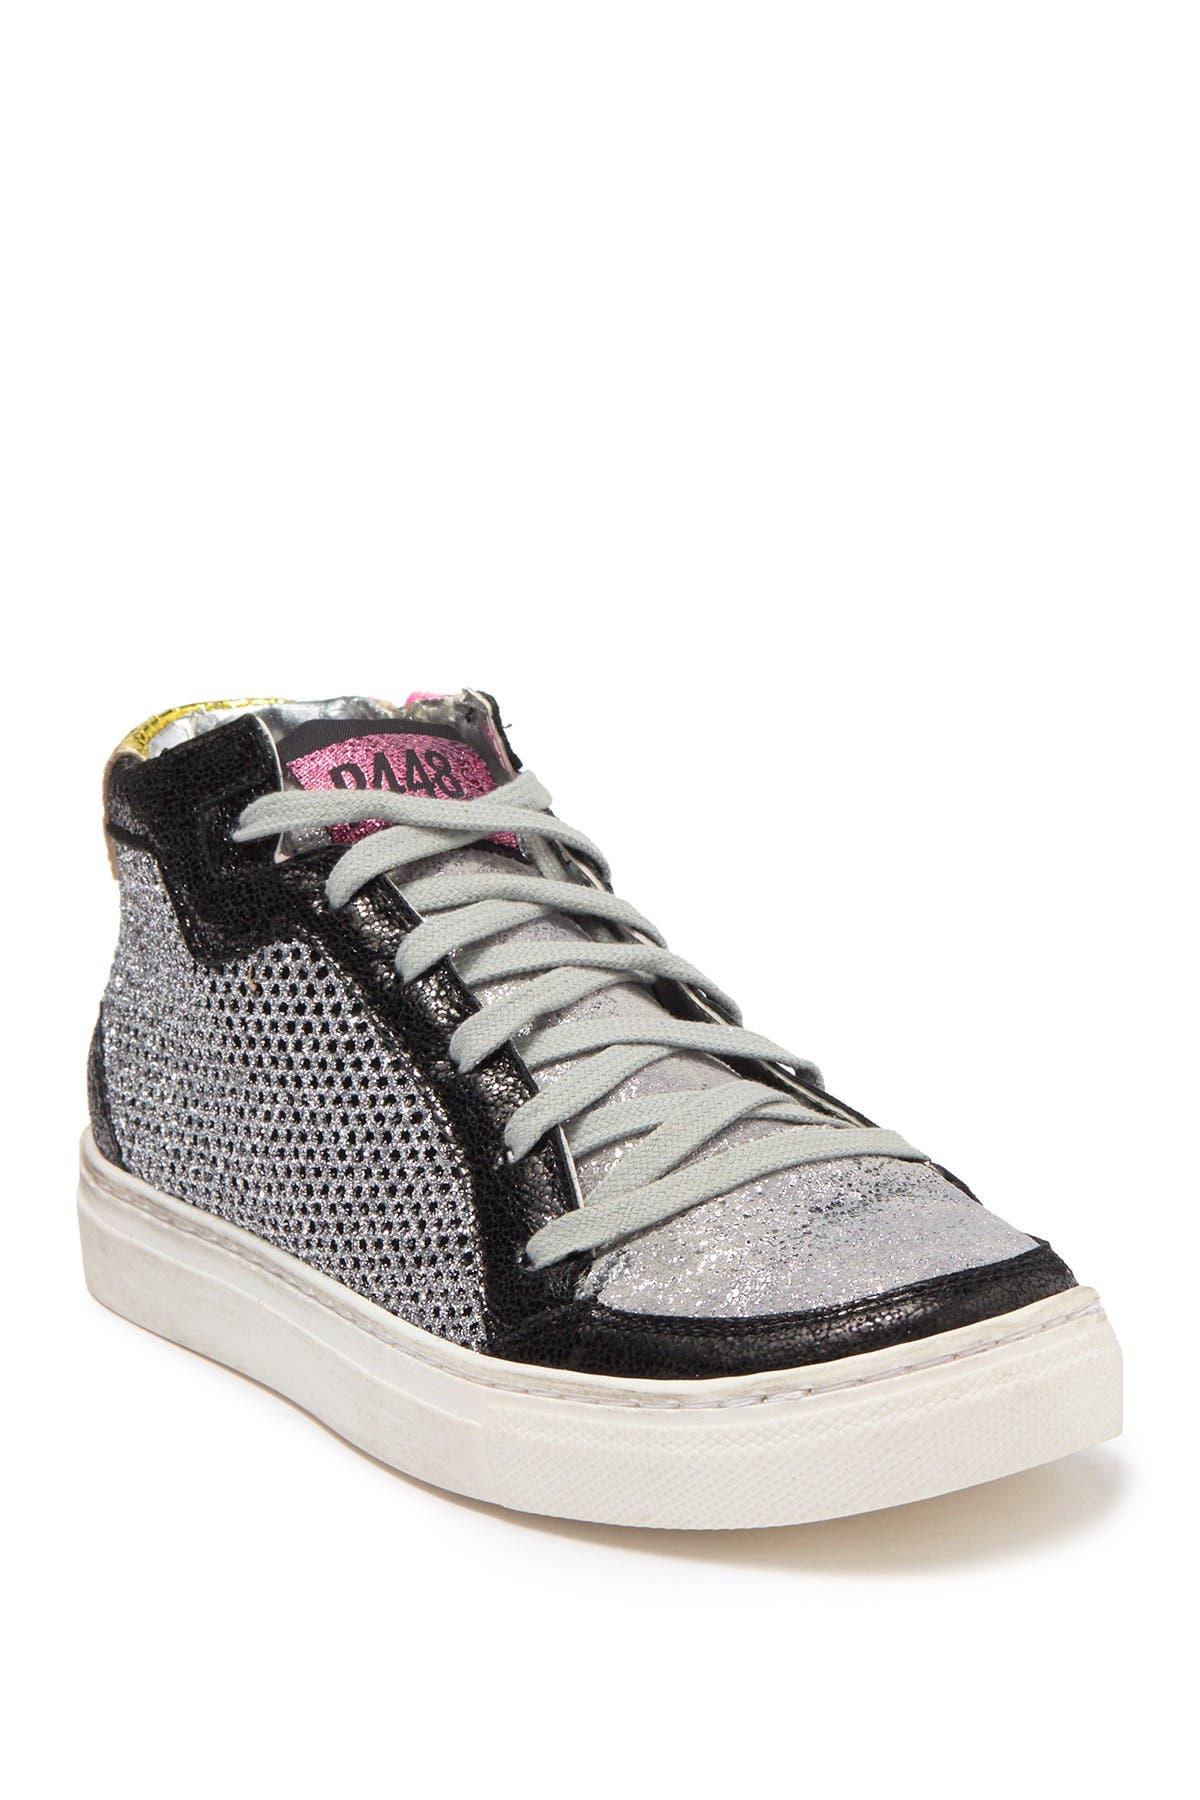 P448 | Love Jr. Metallic Sneaker